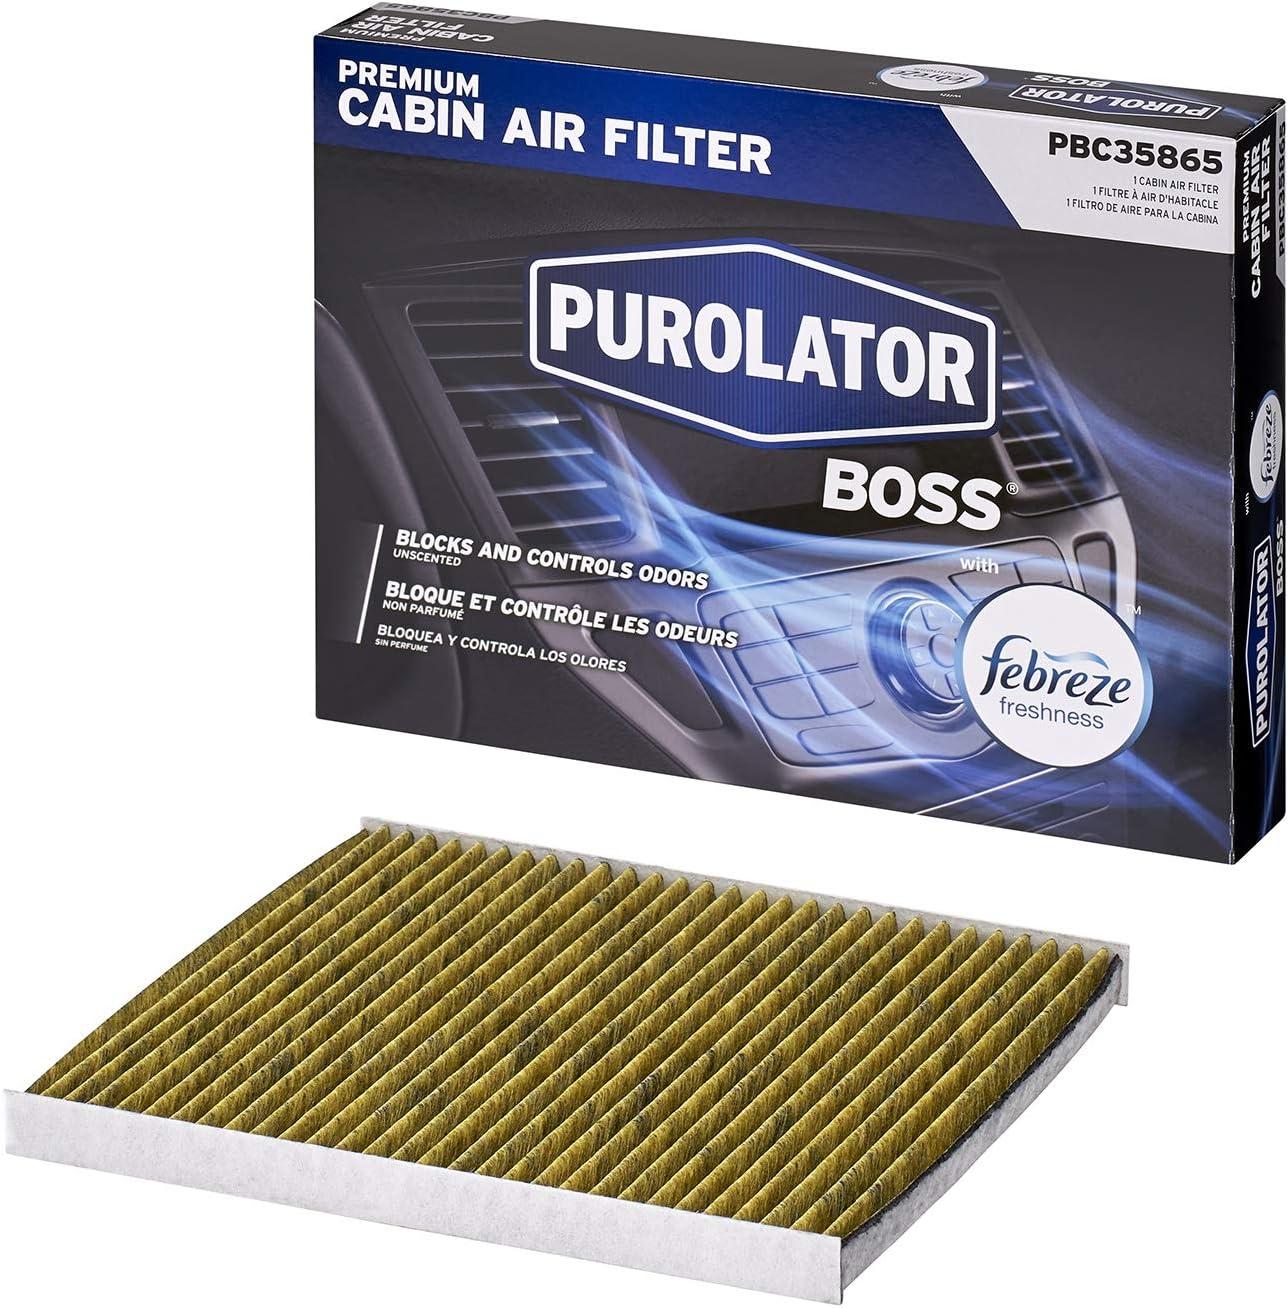 Purolator PBC35865 PurolatorBOSS Premium Cabin Air Filter with Febreze Freshness